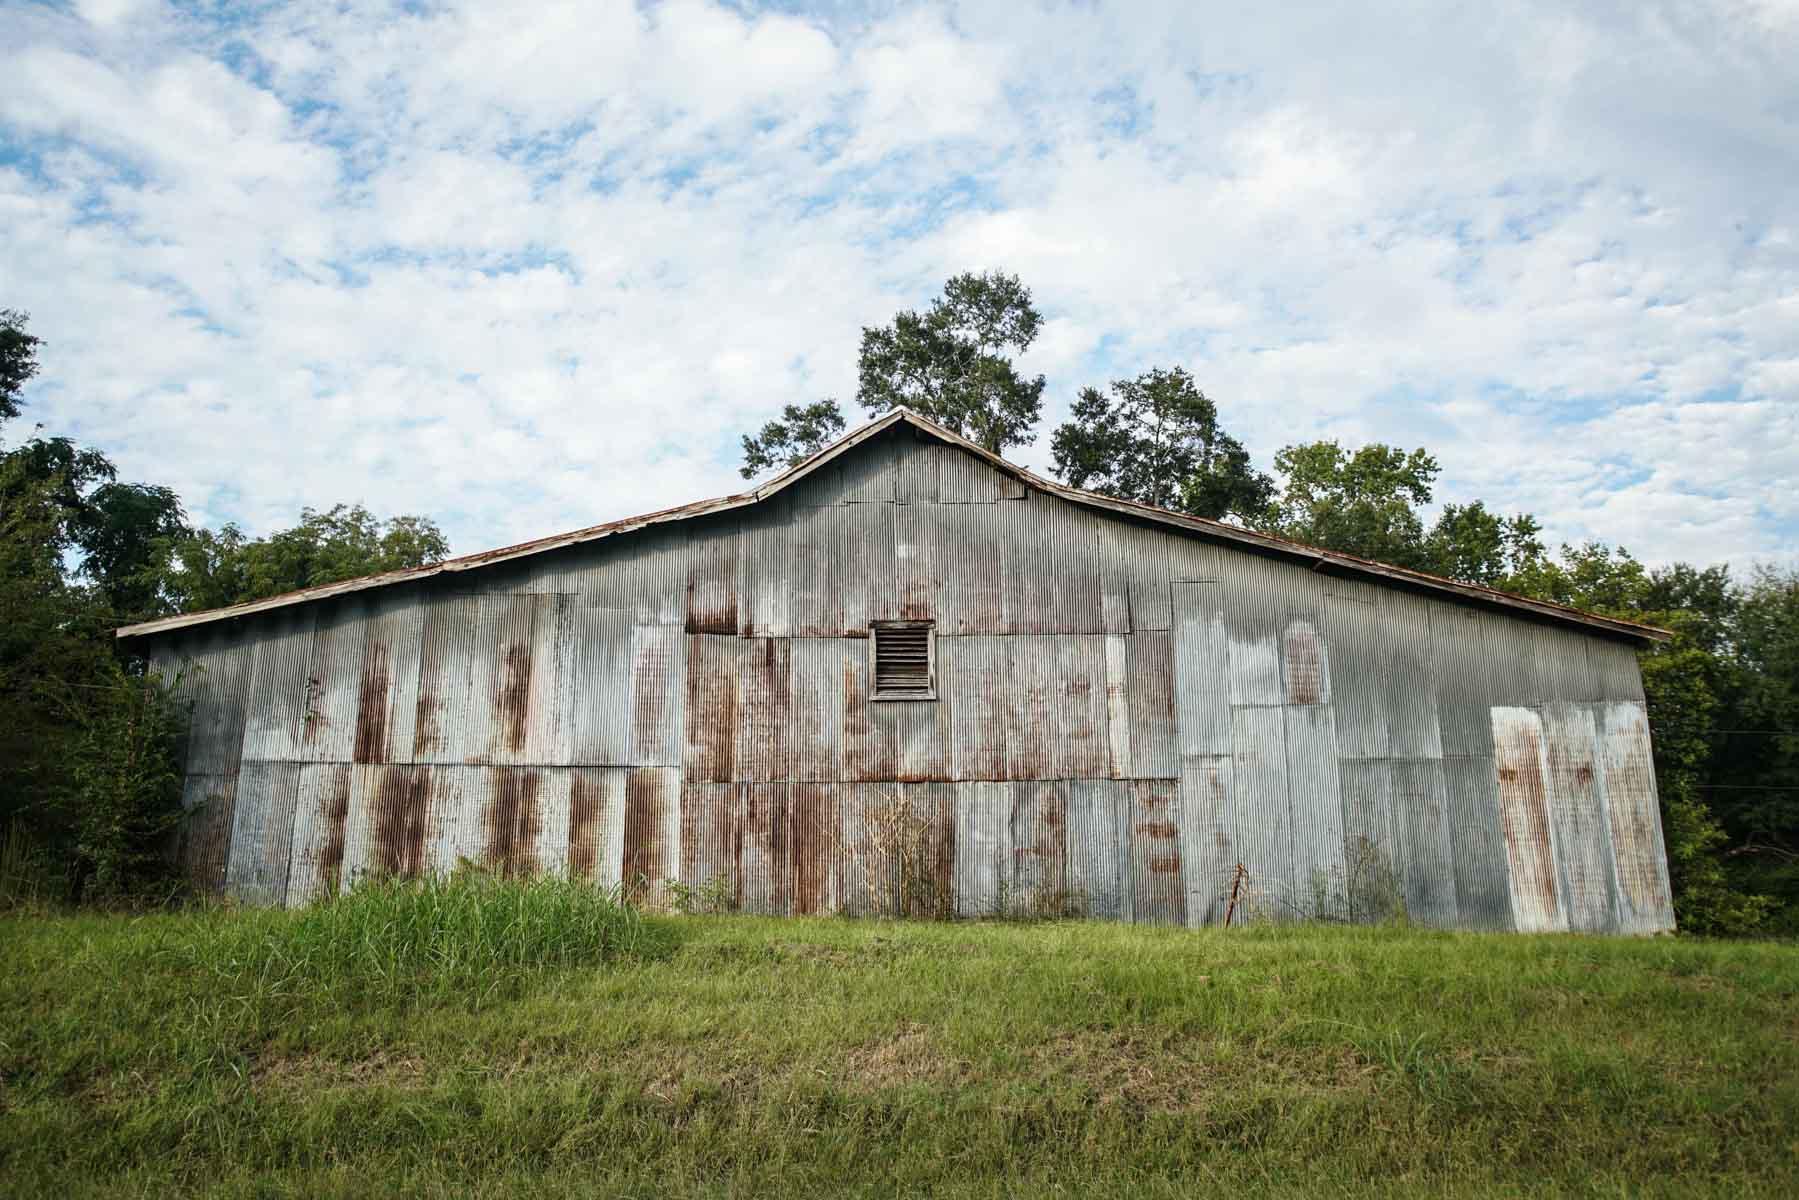 RA_hale county vernacular-07074.jpg